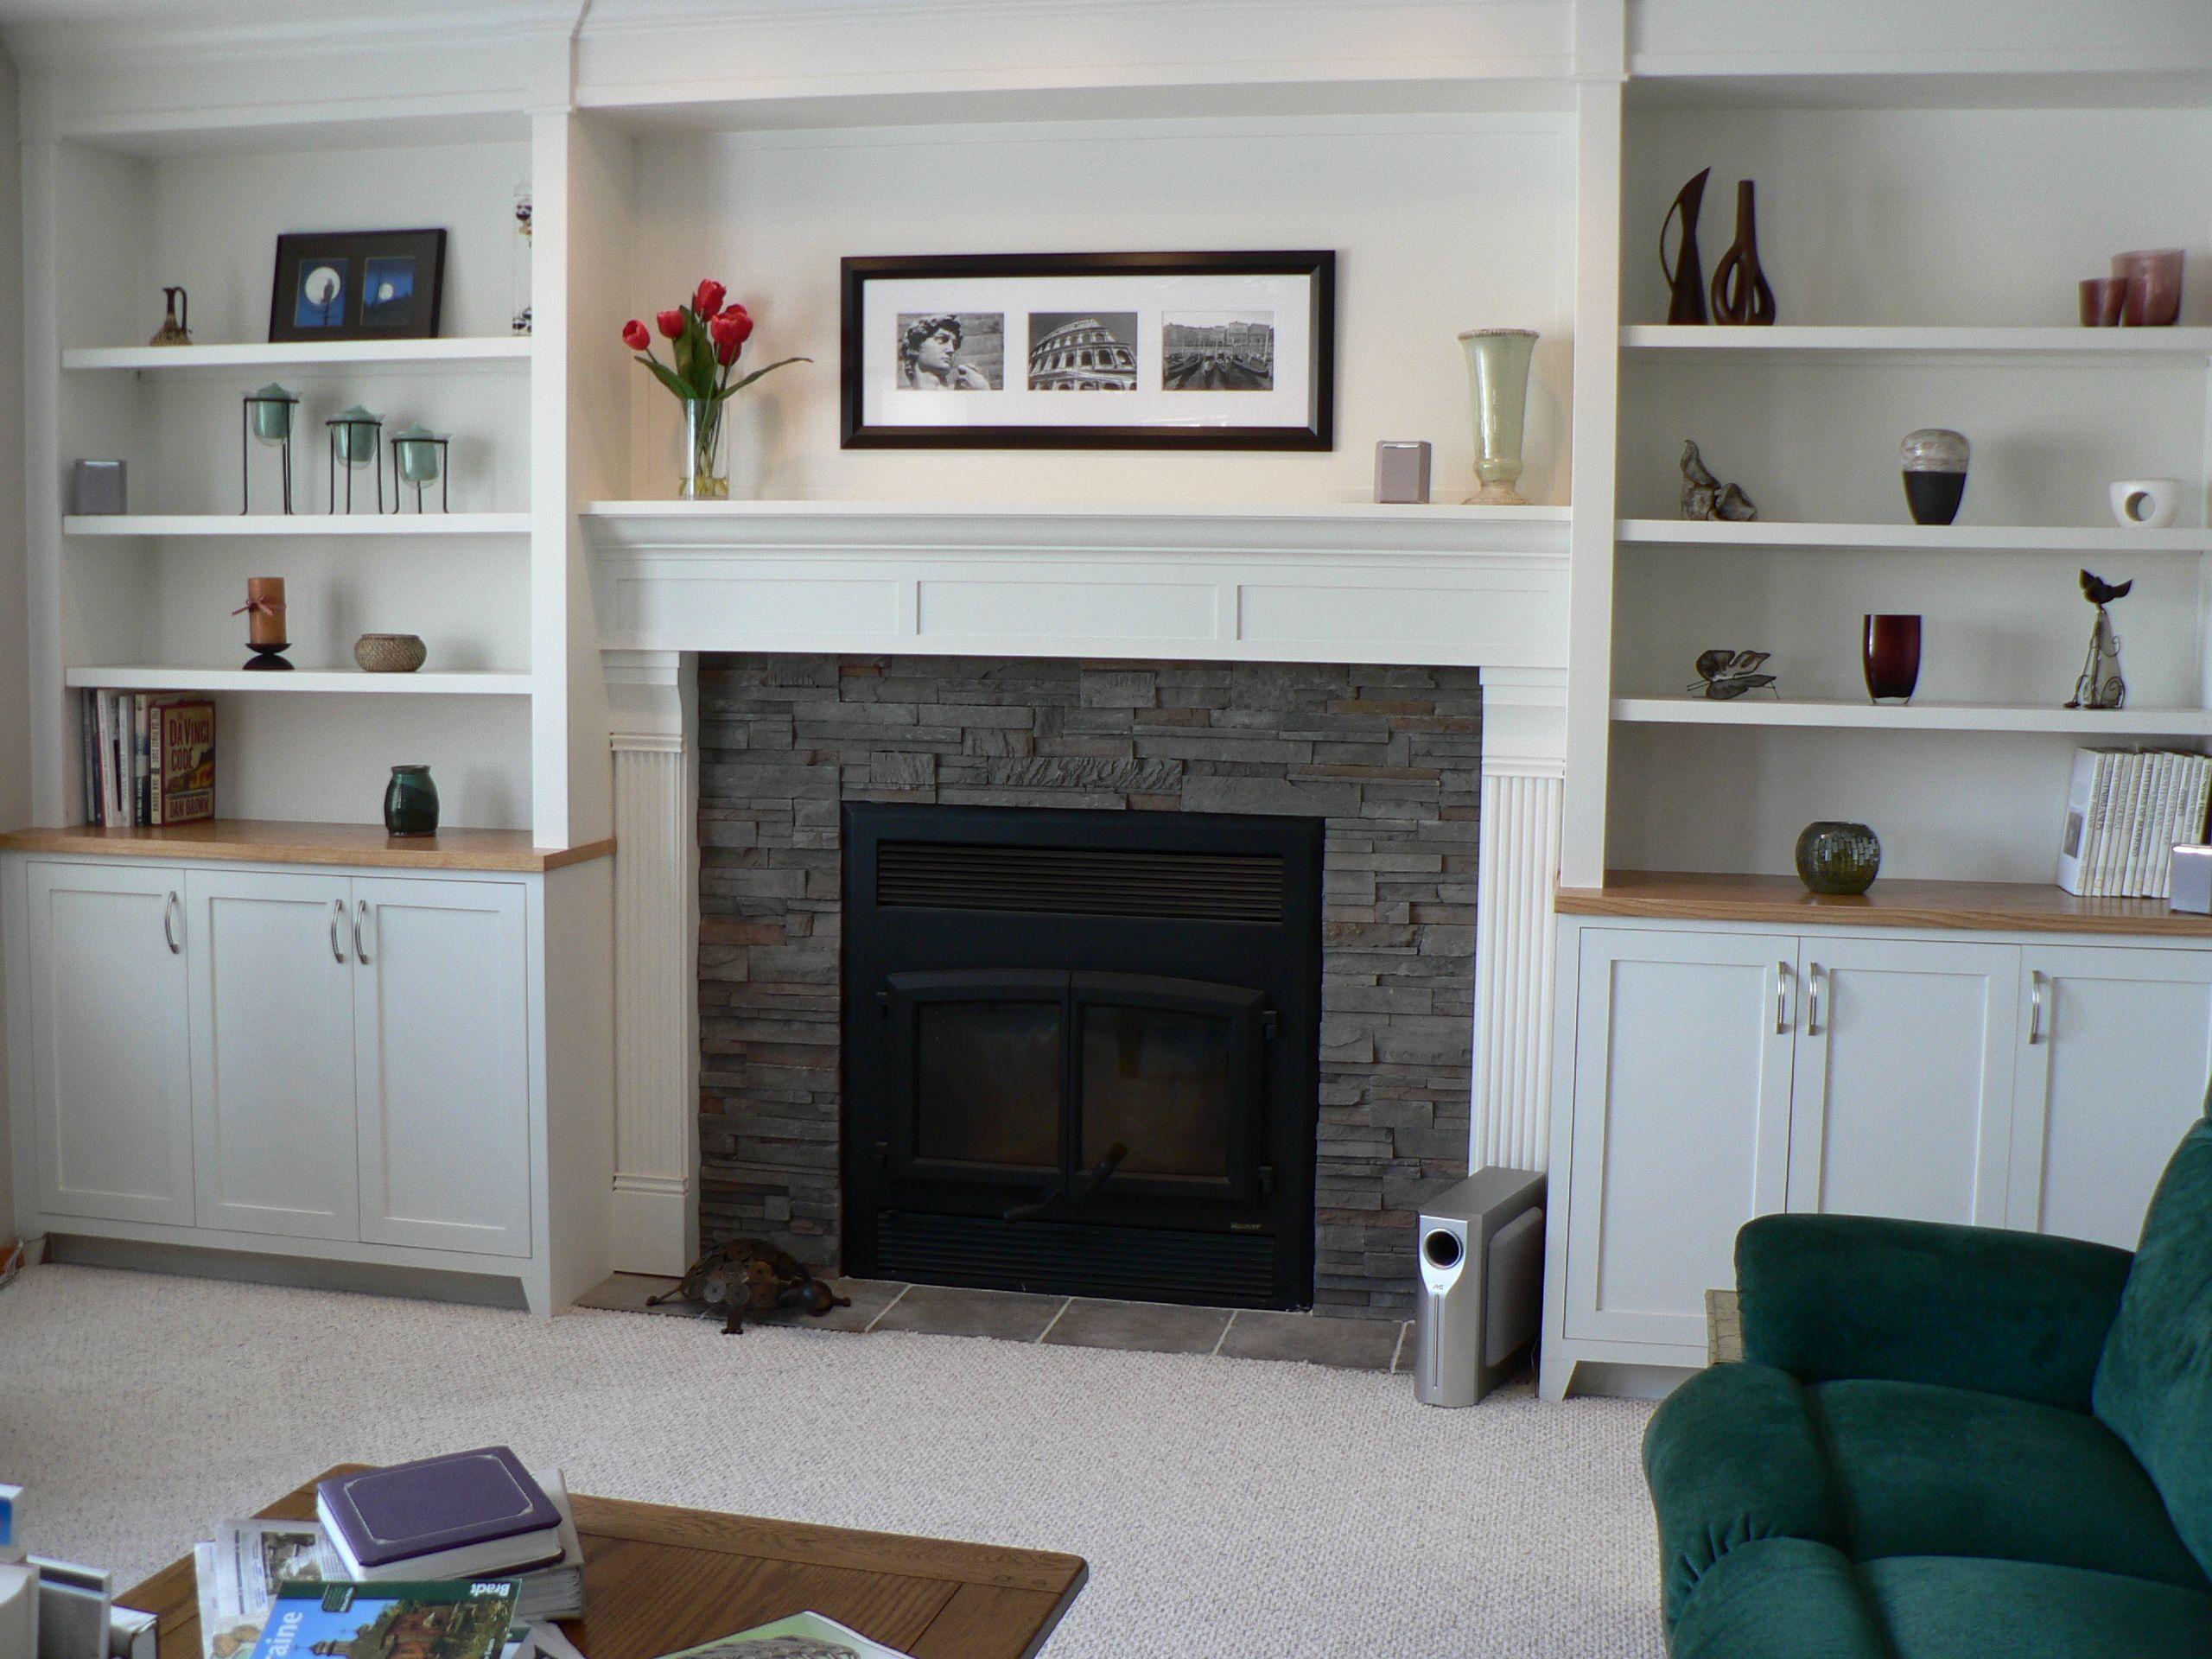 47 Dorable Minimalist Fireplace Decortez Fireplace Bookcase Home Fireplace Fireplace Built Ins